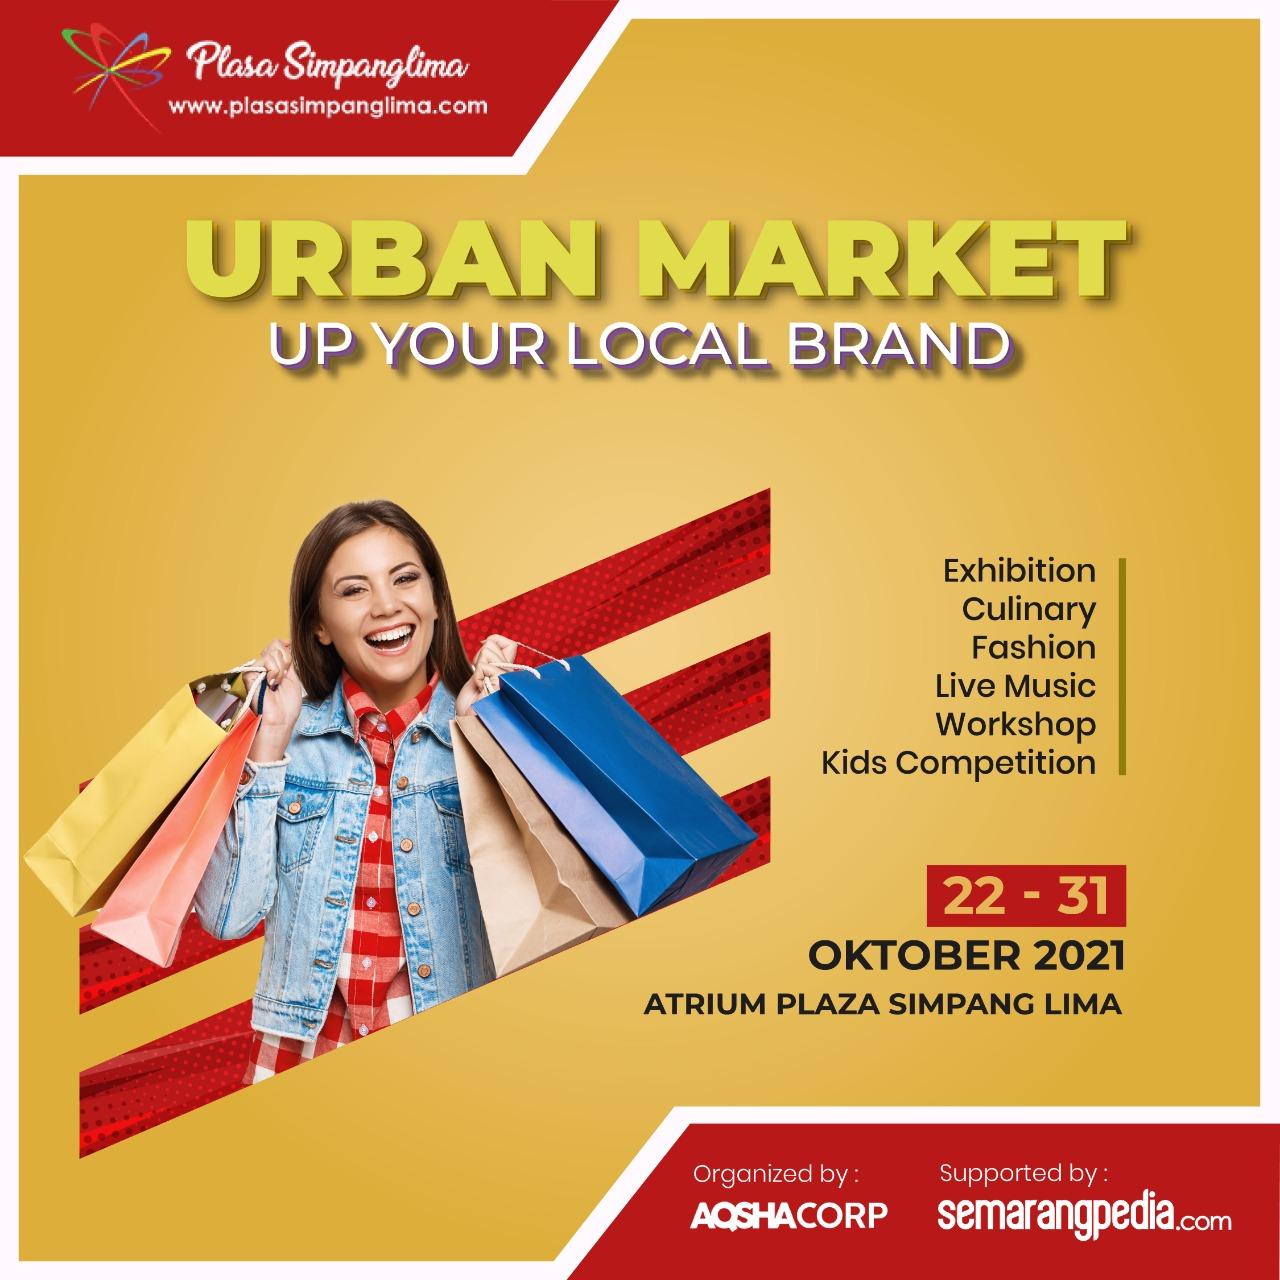 Pameran Urban Market 22 -31 Oktober 2021 Atrium Arjuna Plasa Simpanglima Semarang